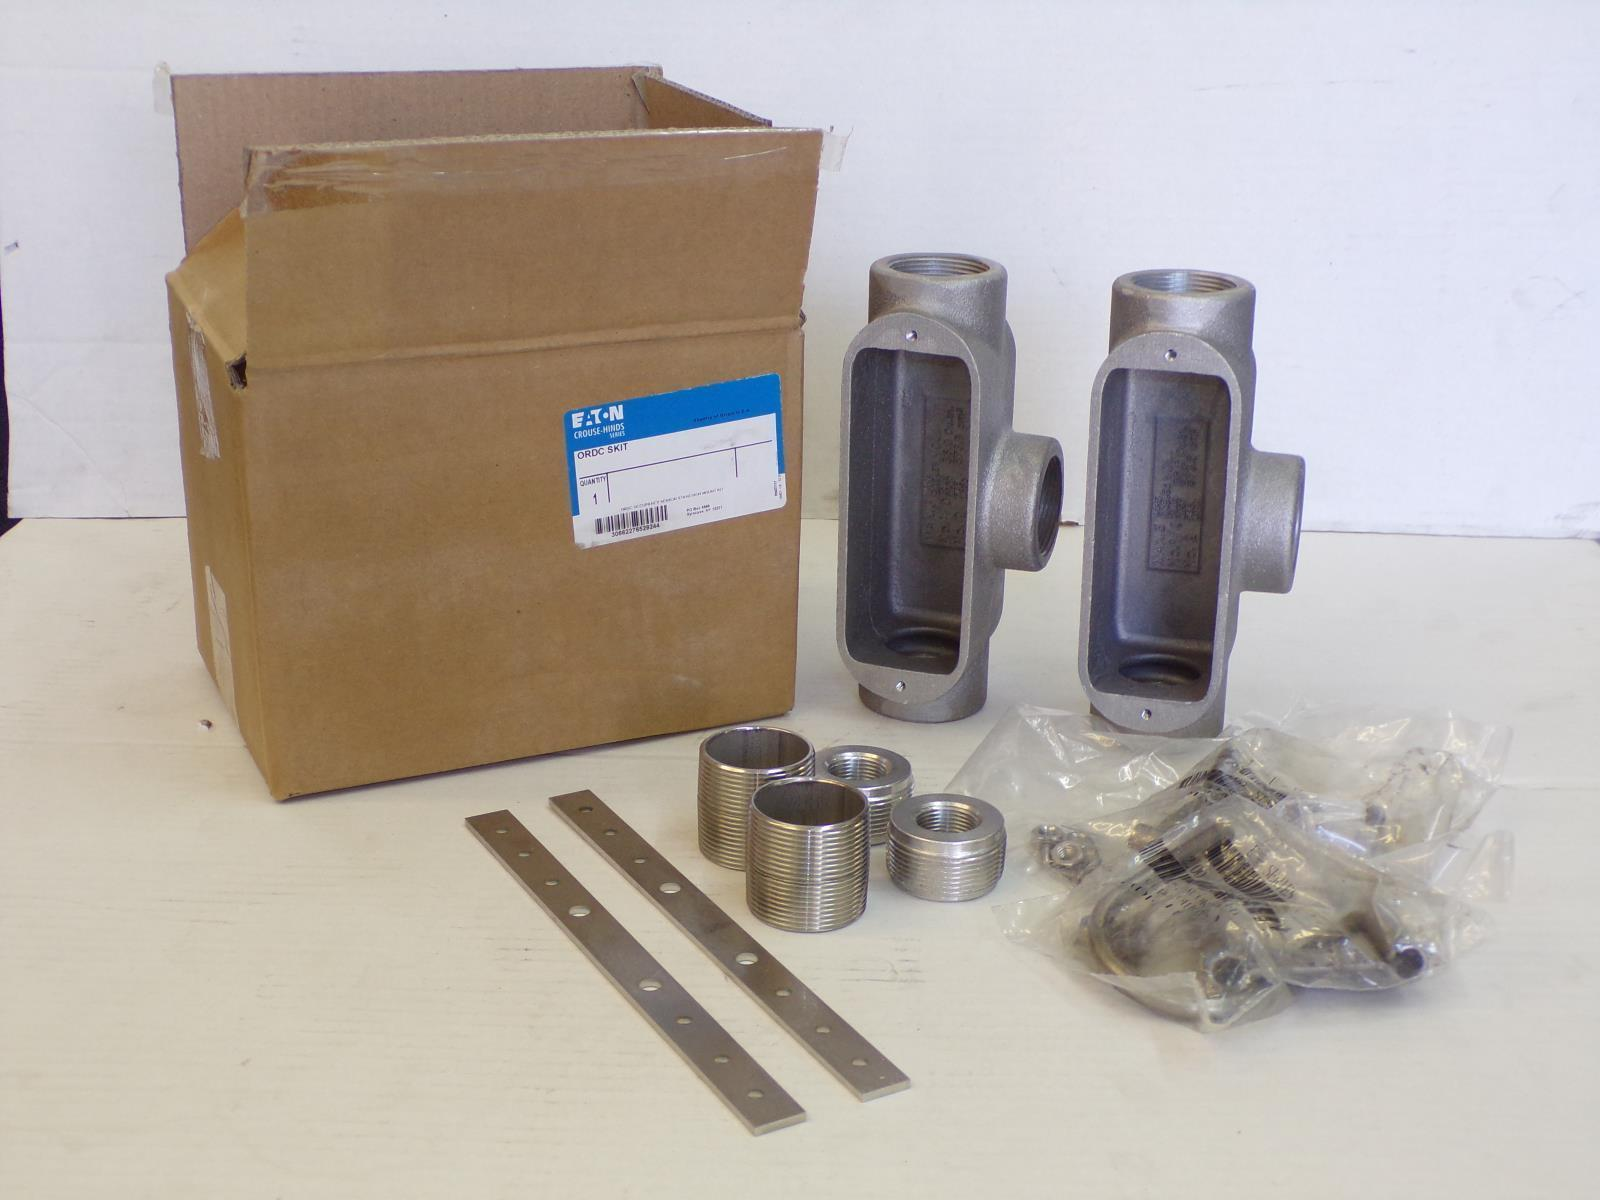 Crouse Hinds Eaton ORDC/SKIT Occupancy Sensor Mounting Kit - $45.53